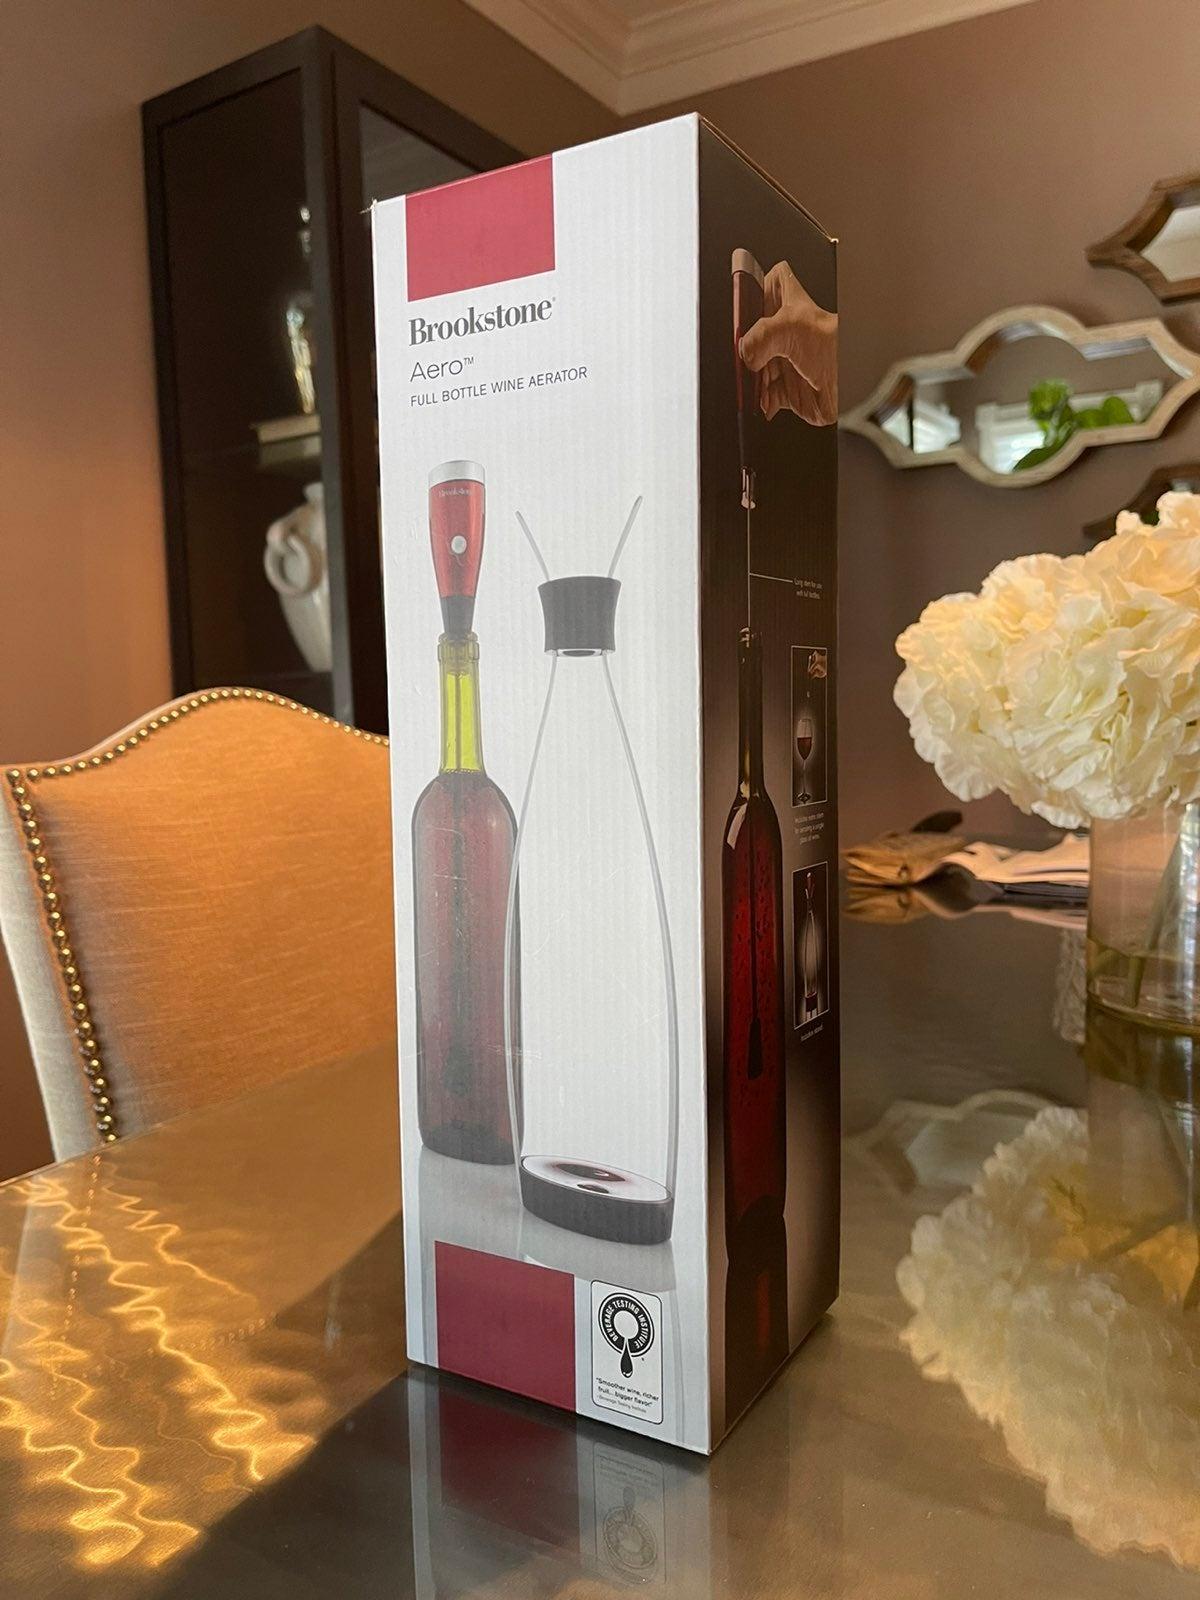 New in box Brookestone Wine Aerator